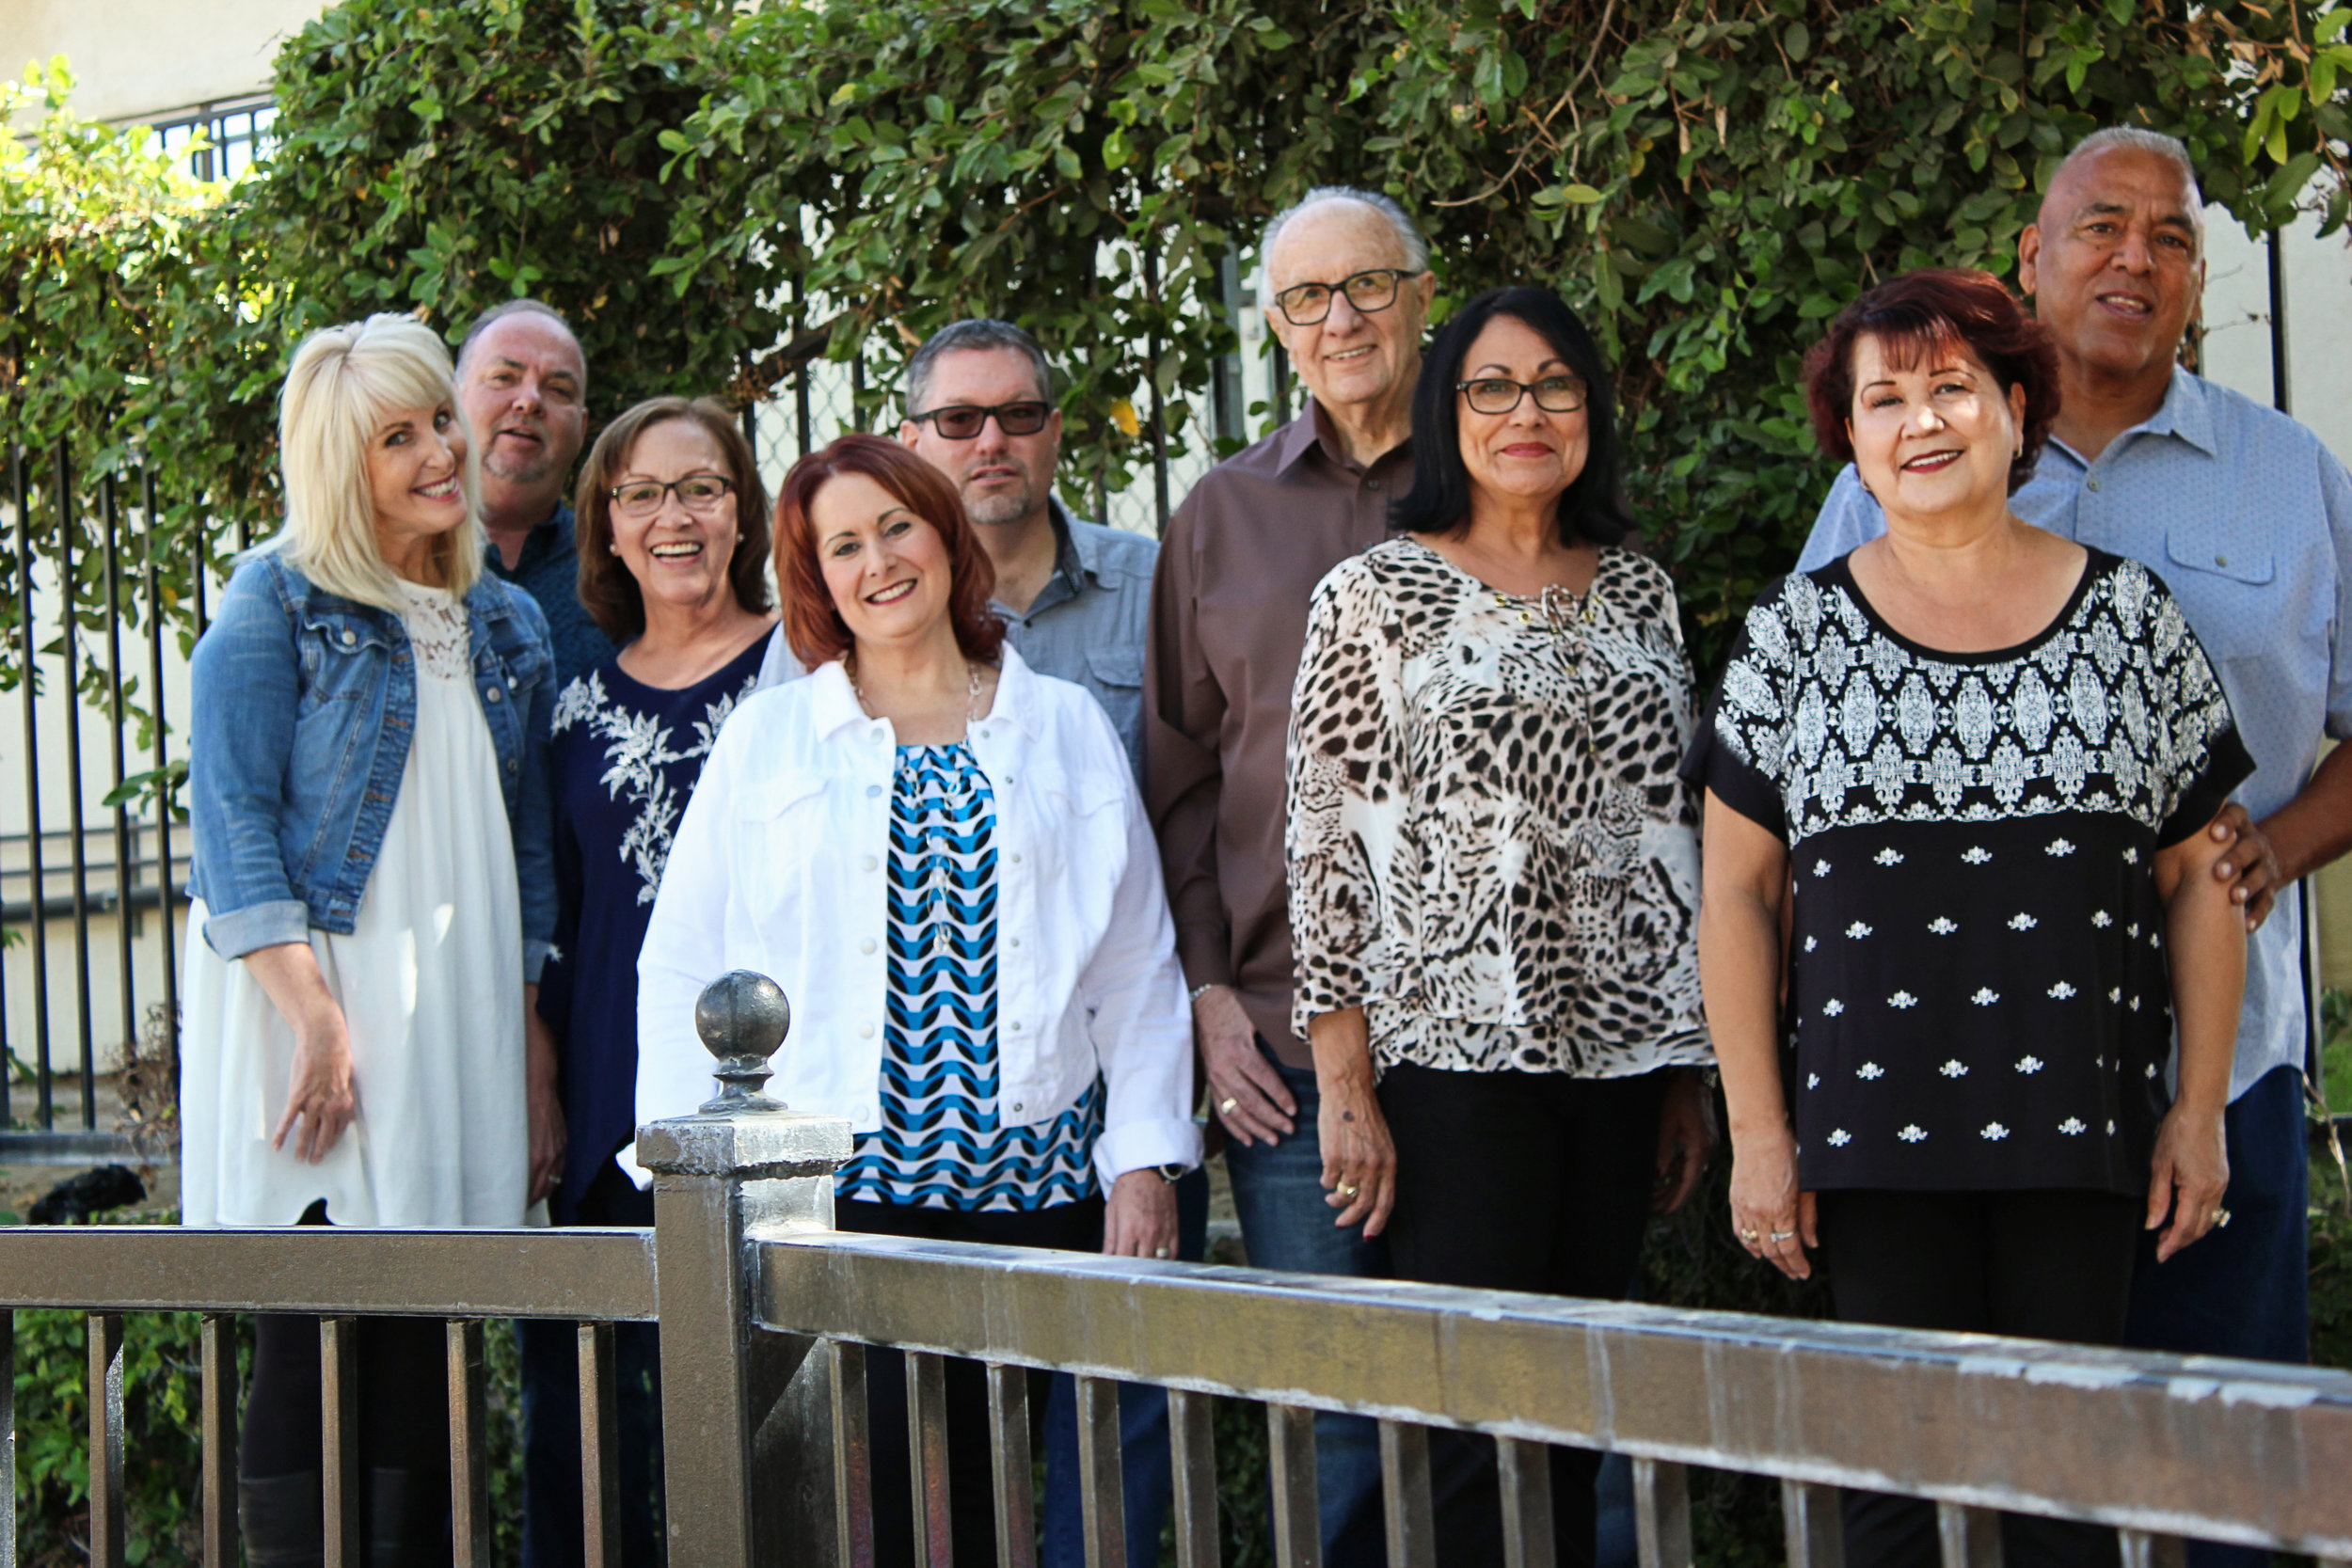 From Left to Right: Diane & Wade Jenkins; Rosario Gomez; Pam & Geoffrey Crain, Ed & Bea Combs; Cynthia & Arthur Juarez